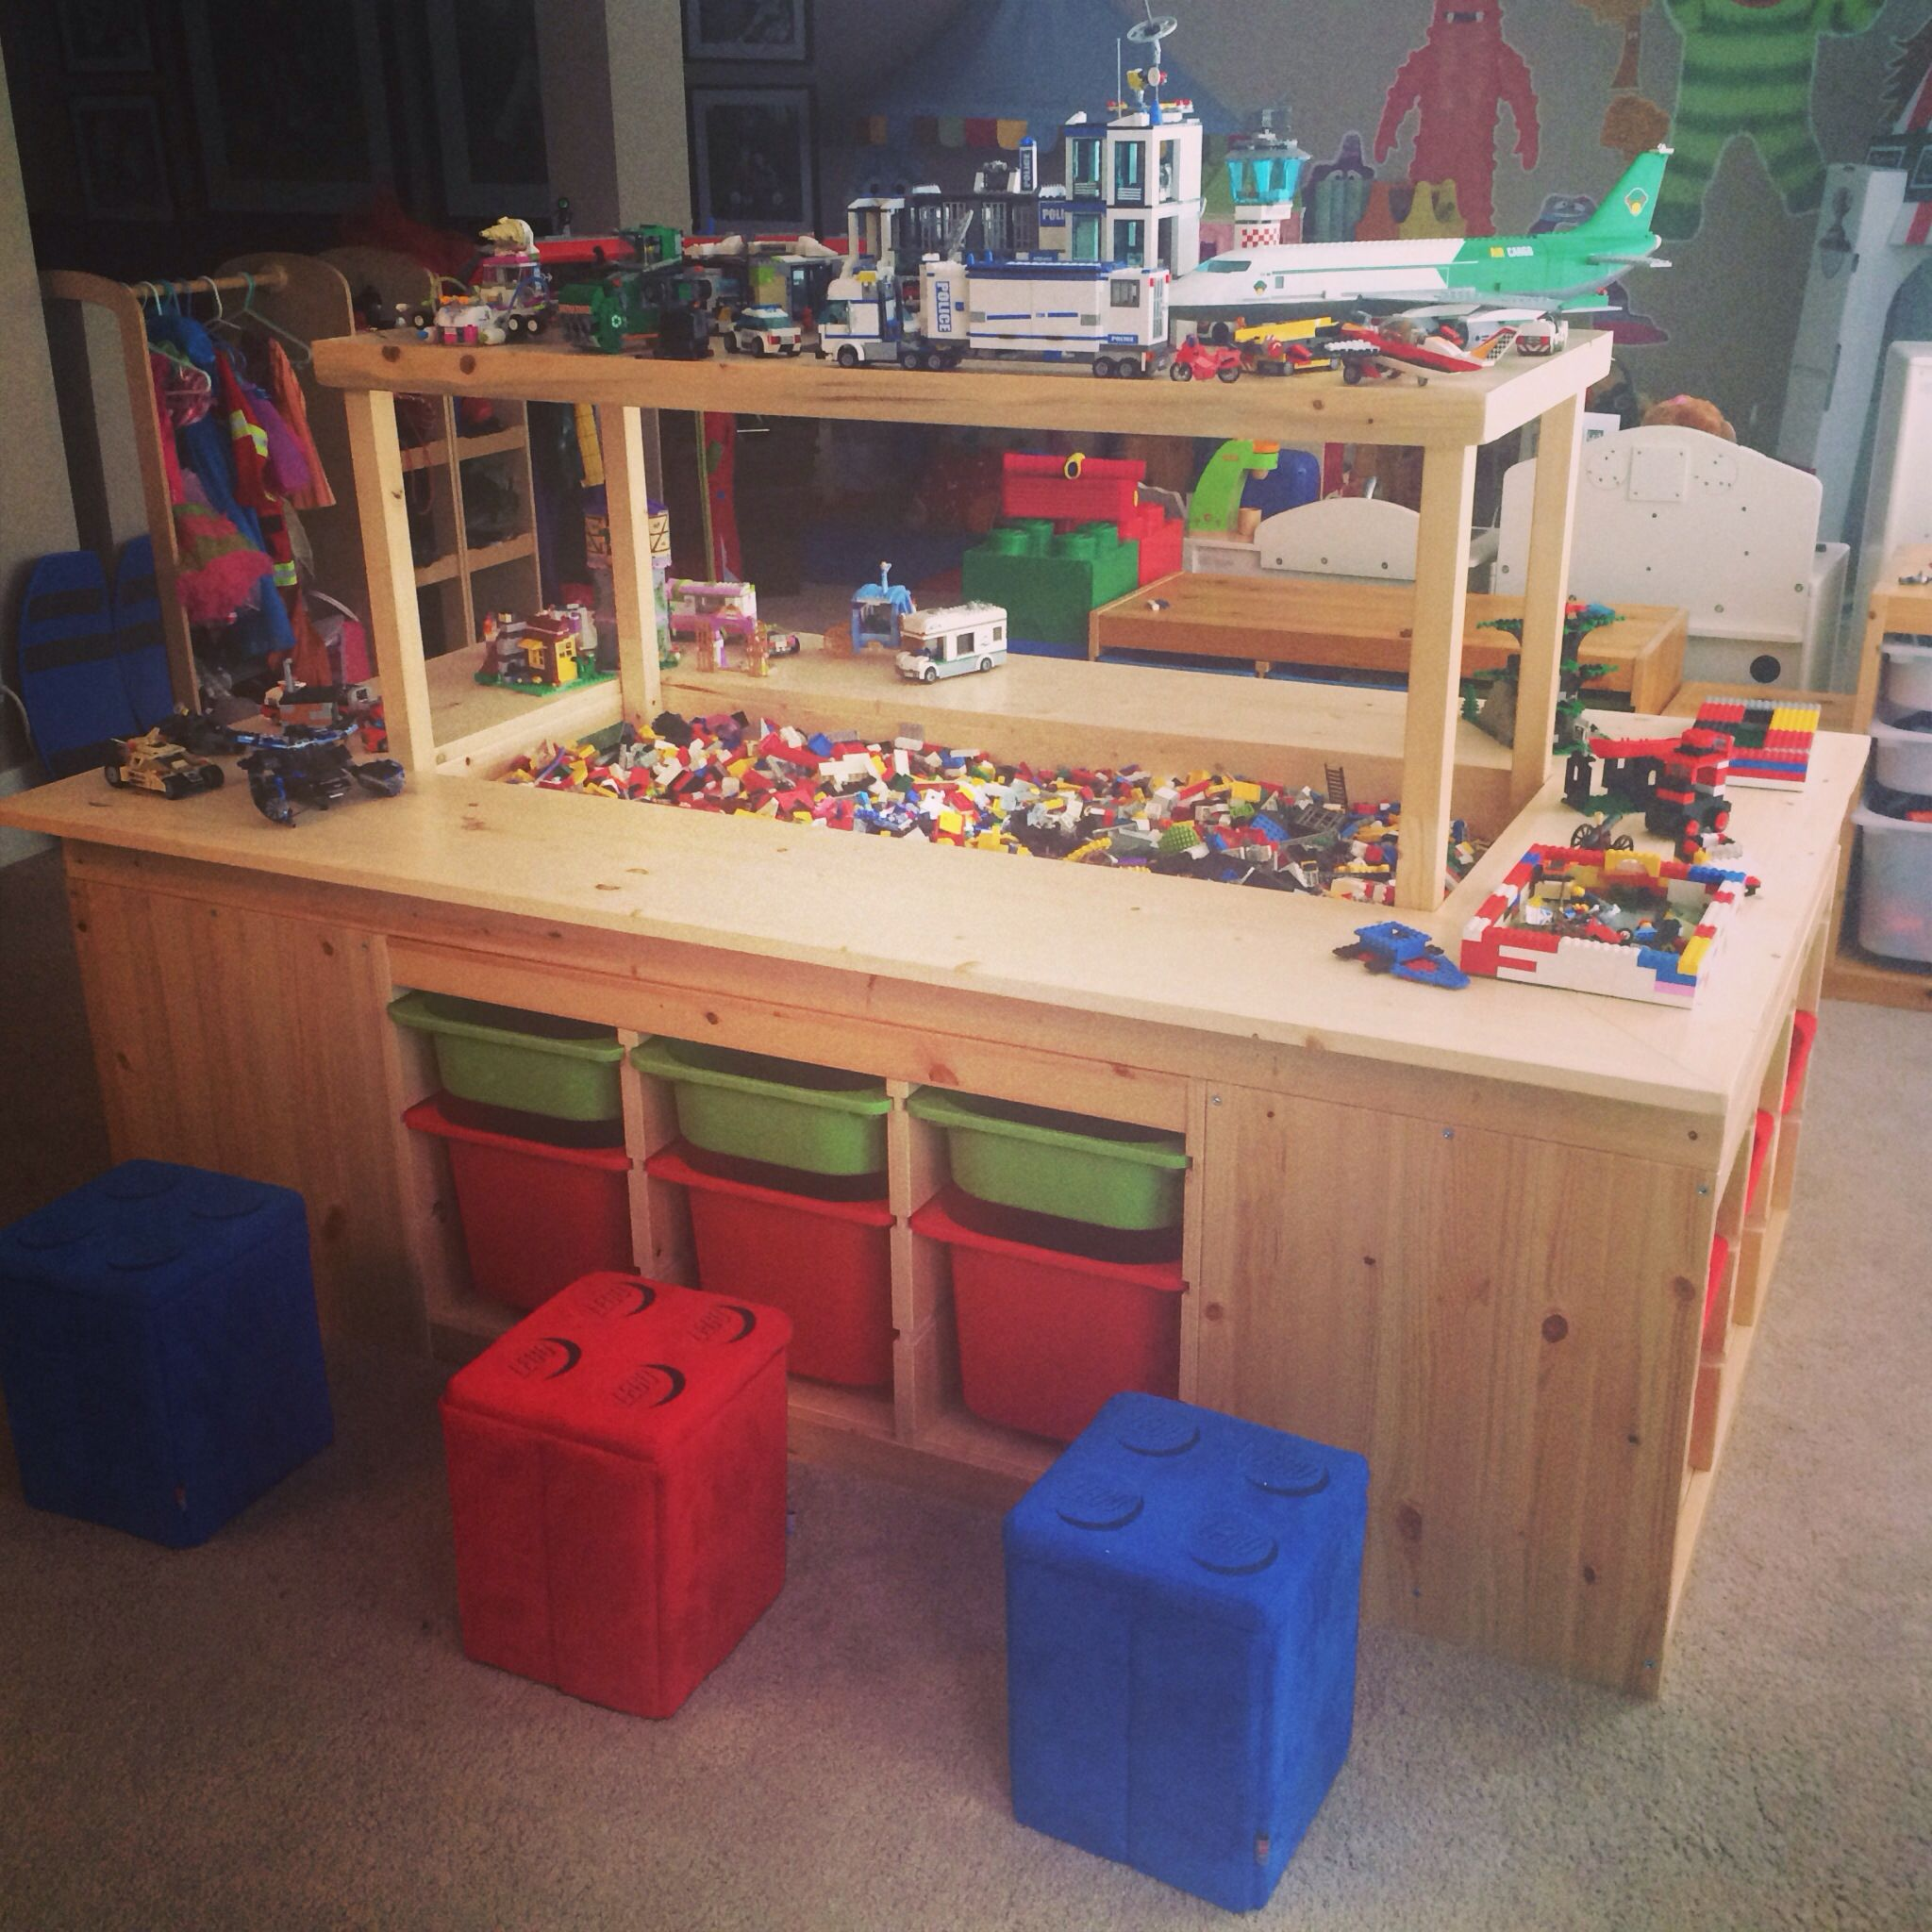 Steve Built The Kids The Most Amazing Lego Table Legofun Lego Table Diy Lego Bedroom Lego Room